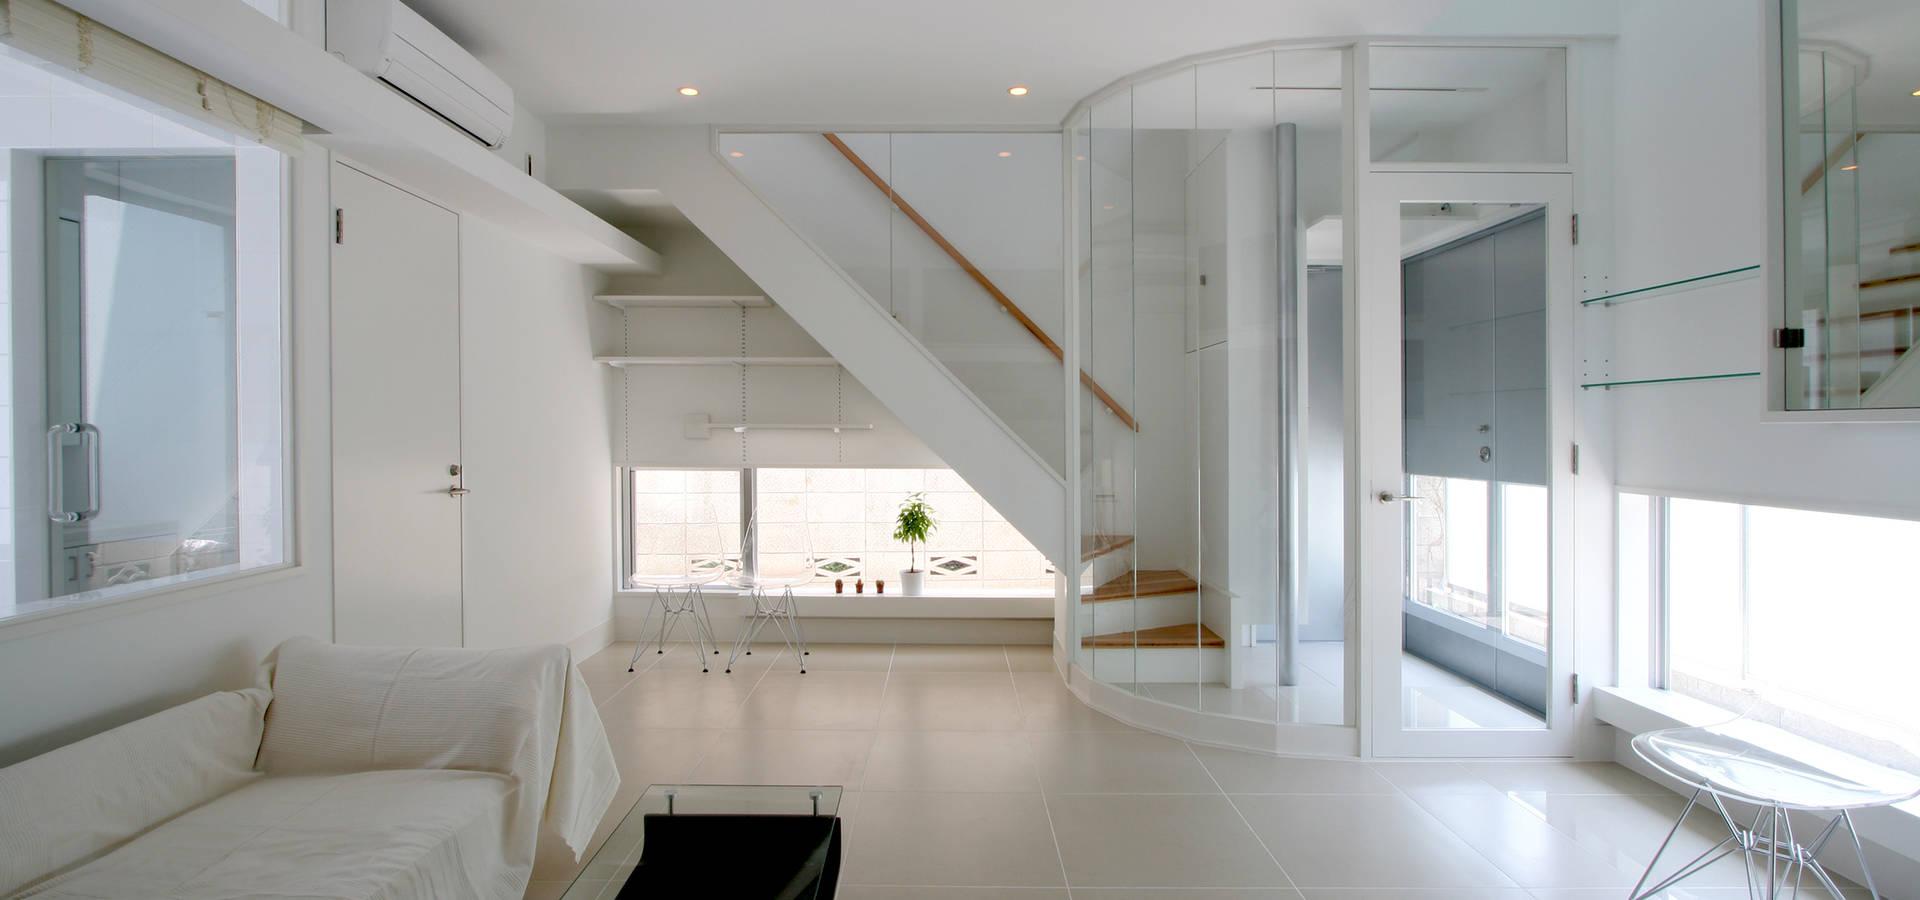 K. Shindo Architects and Associates